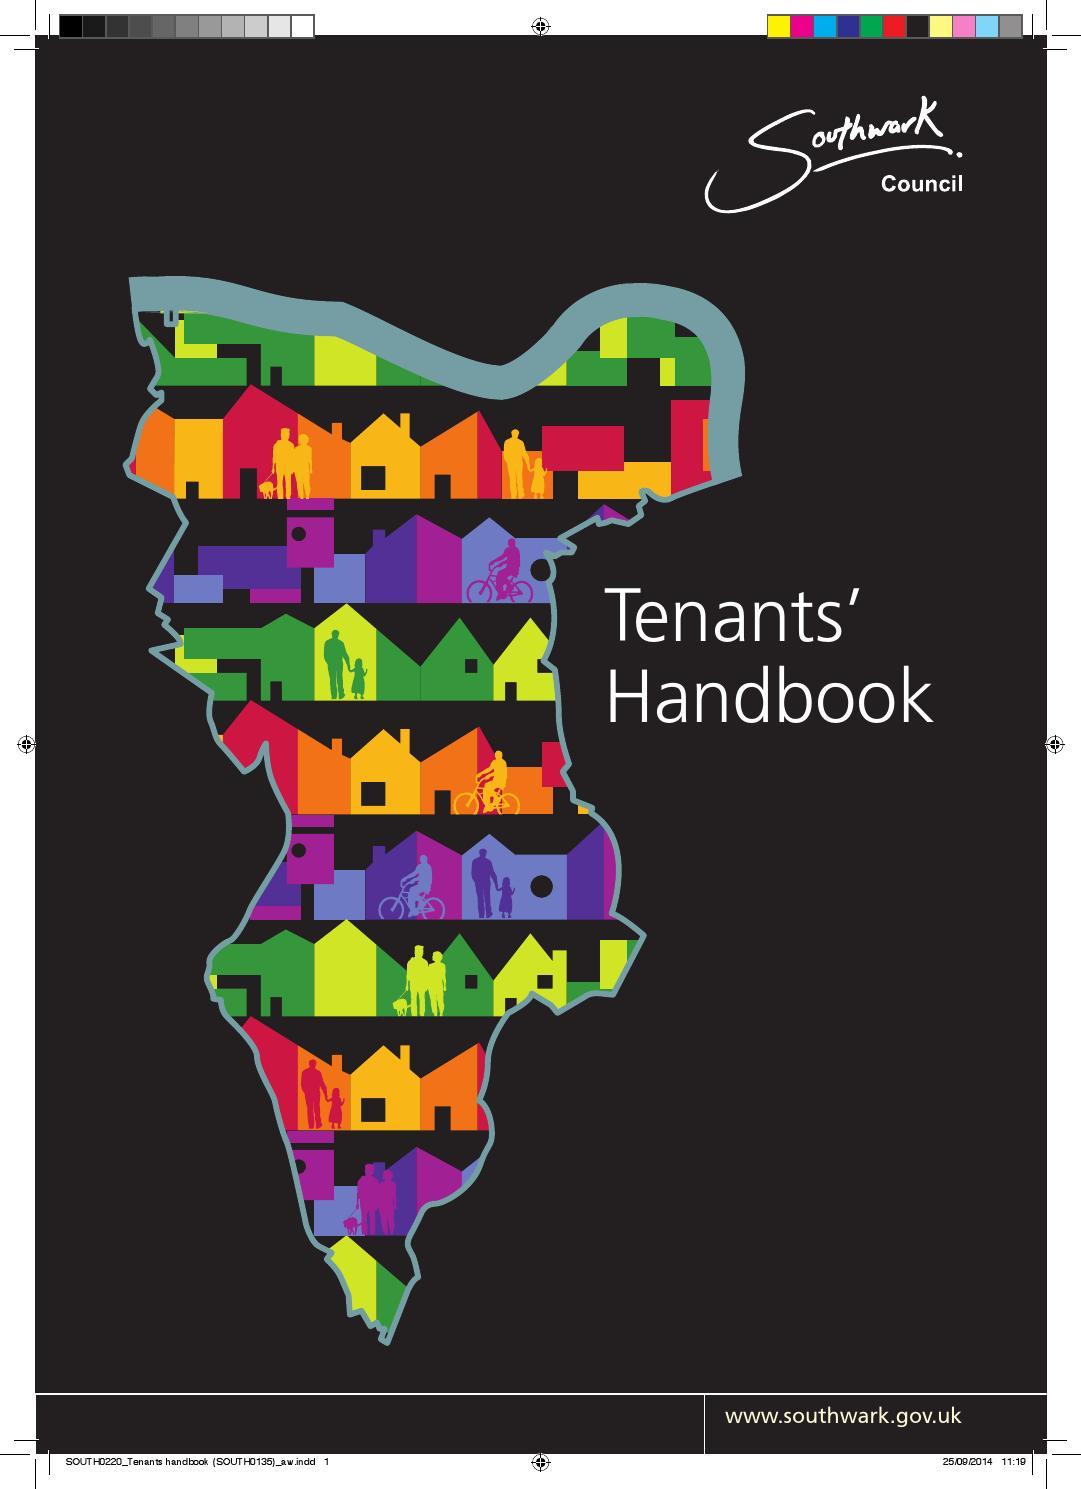 Southwark Tenants Handbook By Southwark Council Issuu